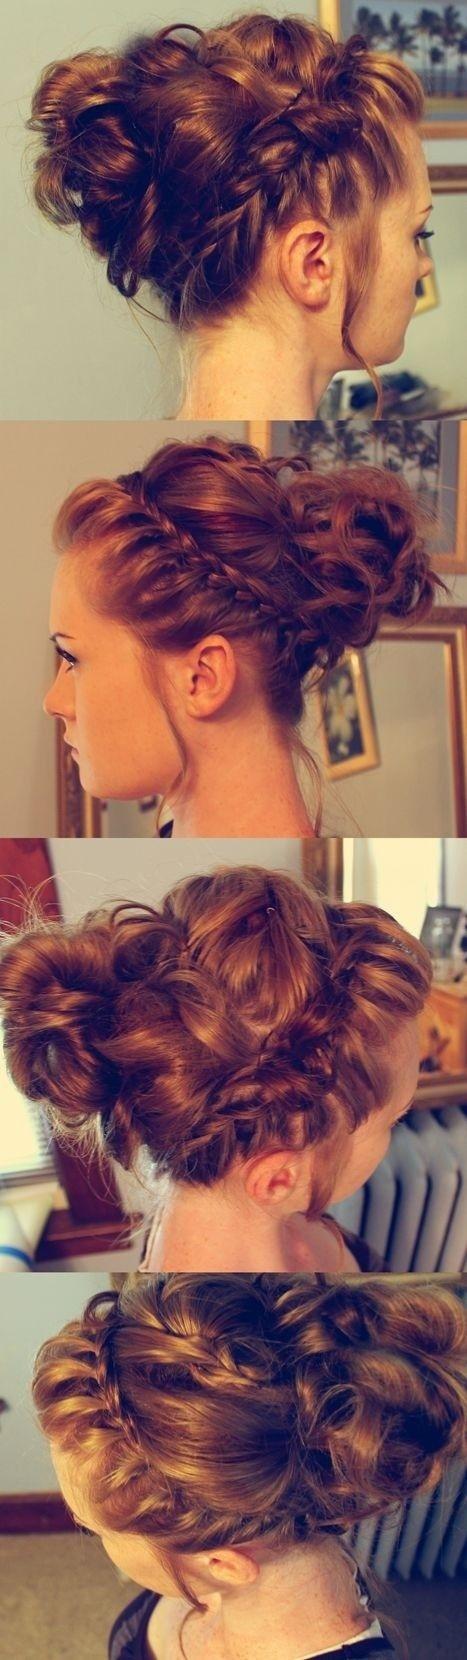 coiffure-printemps-16